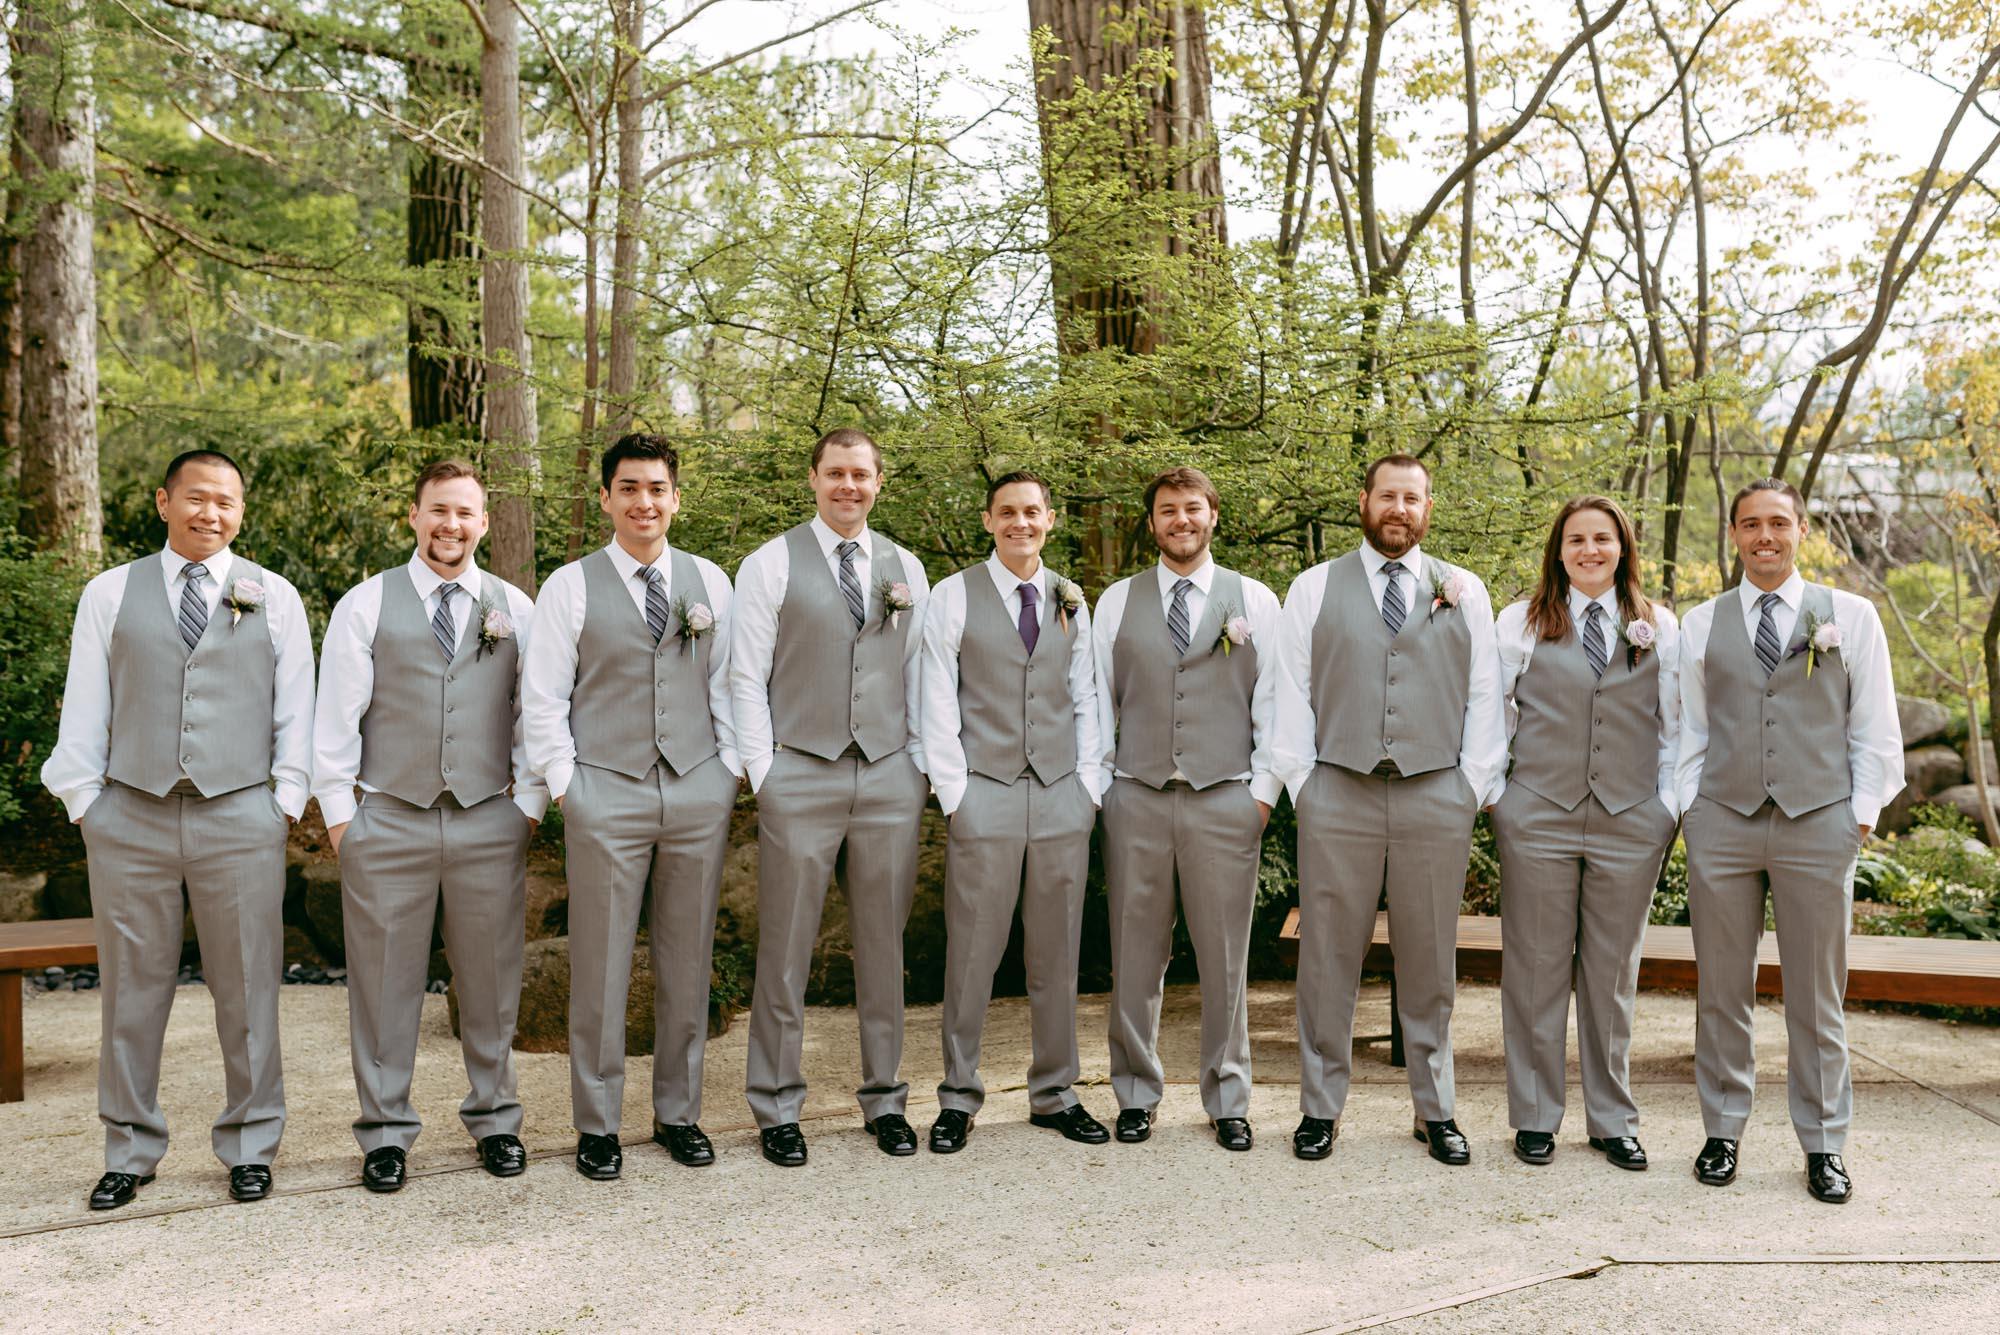 prairie-street-brewhouse-wedding-Rockford-IL-wedding-photographers-1.jpg